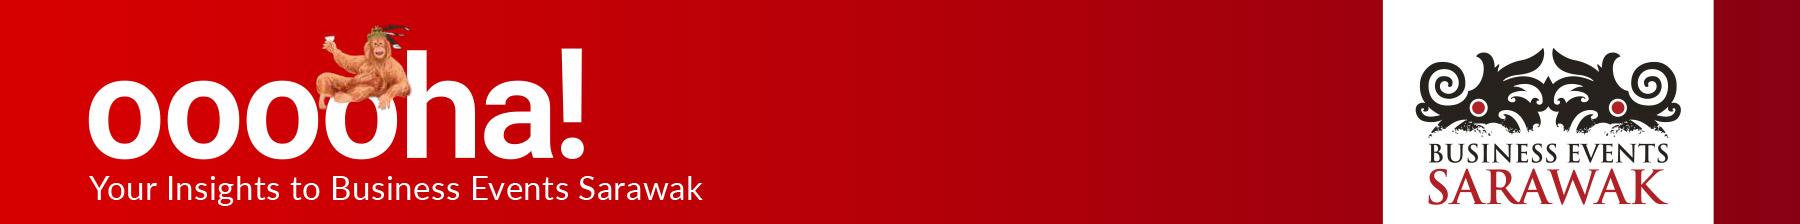 BESarawak Industry Related News – Jan 2021